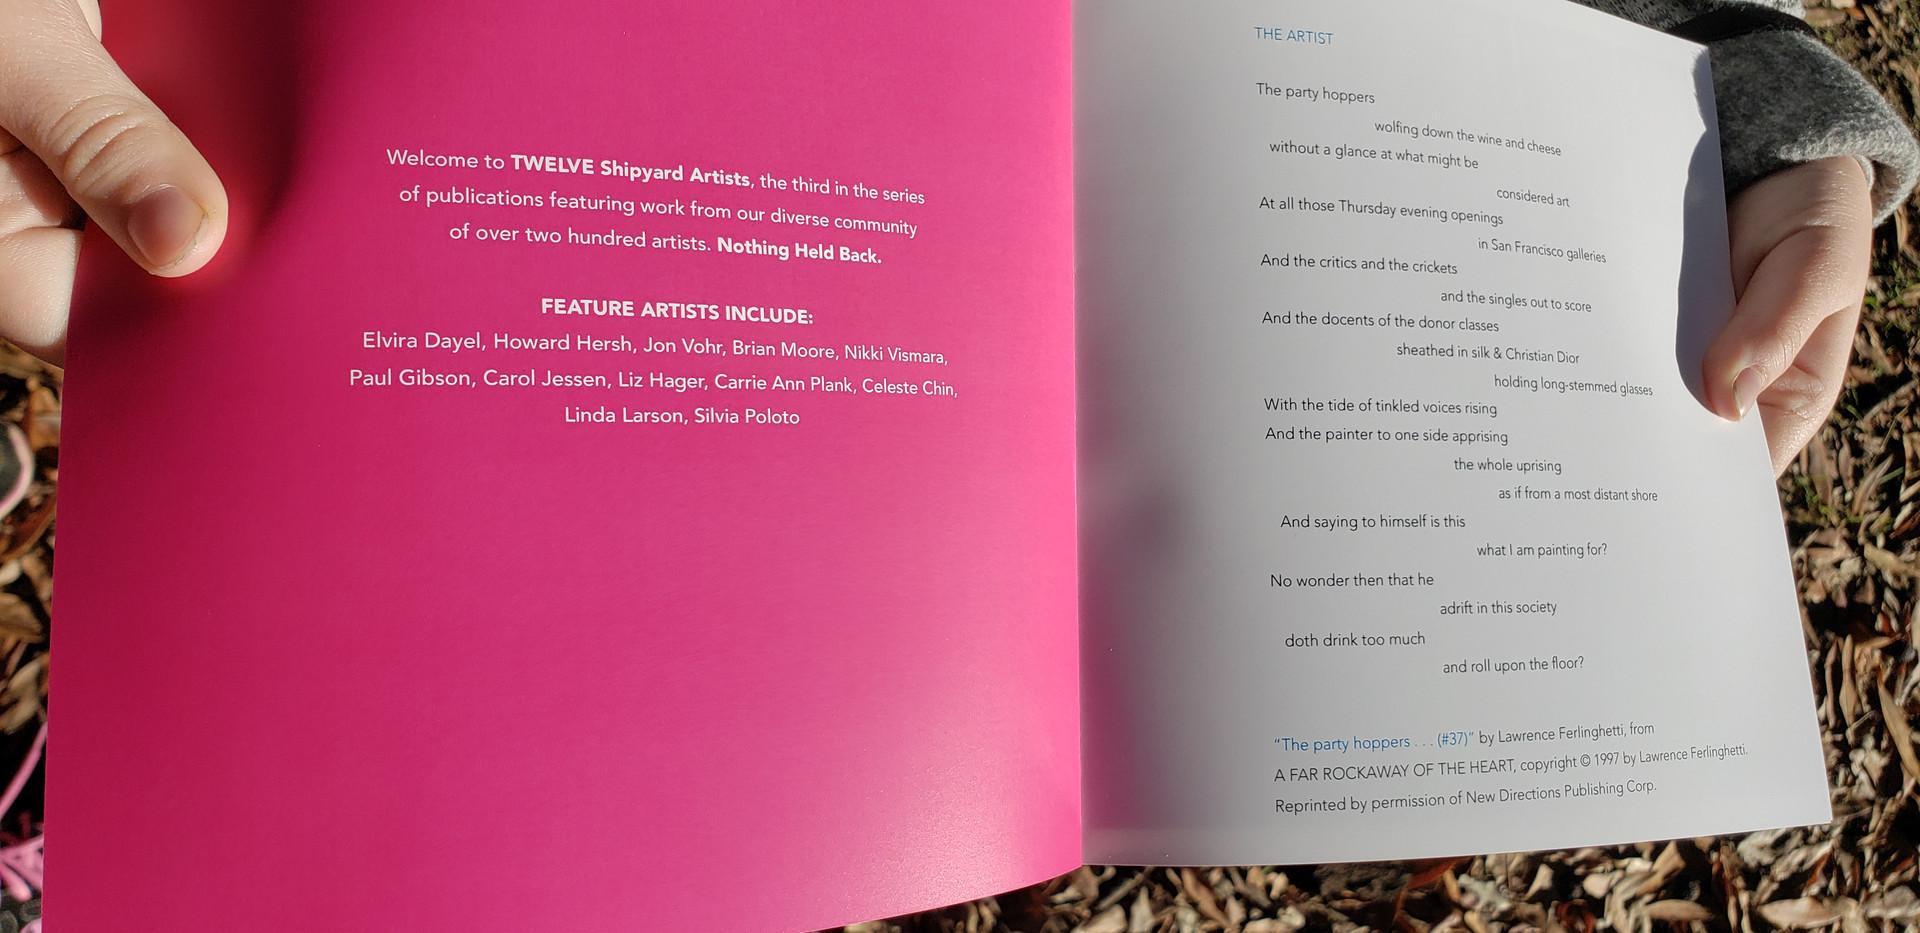 artist book: TWELVE (Hunter's Point Shipyard Artists)